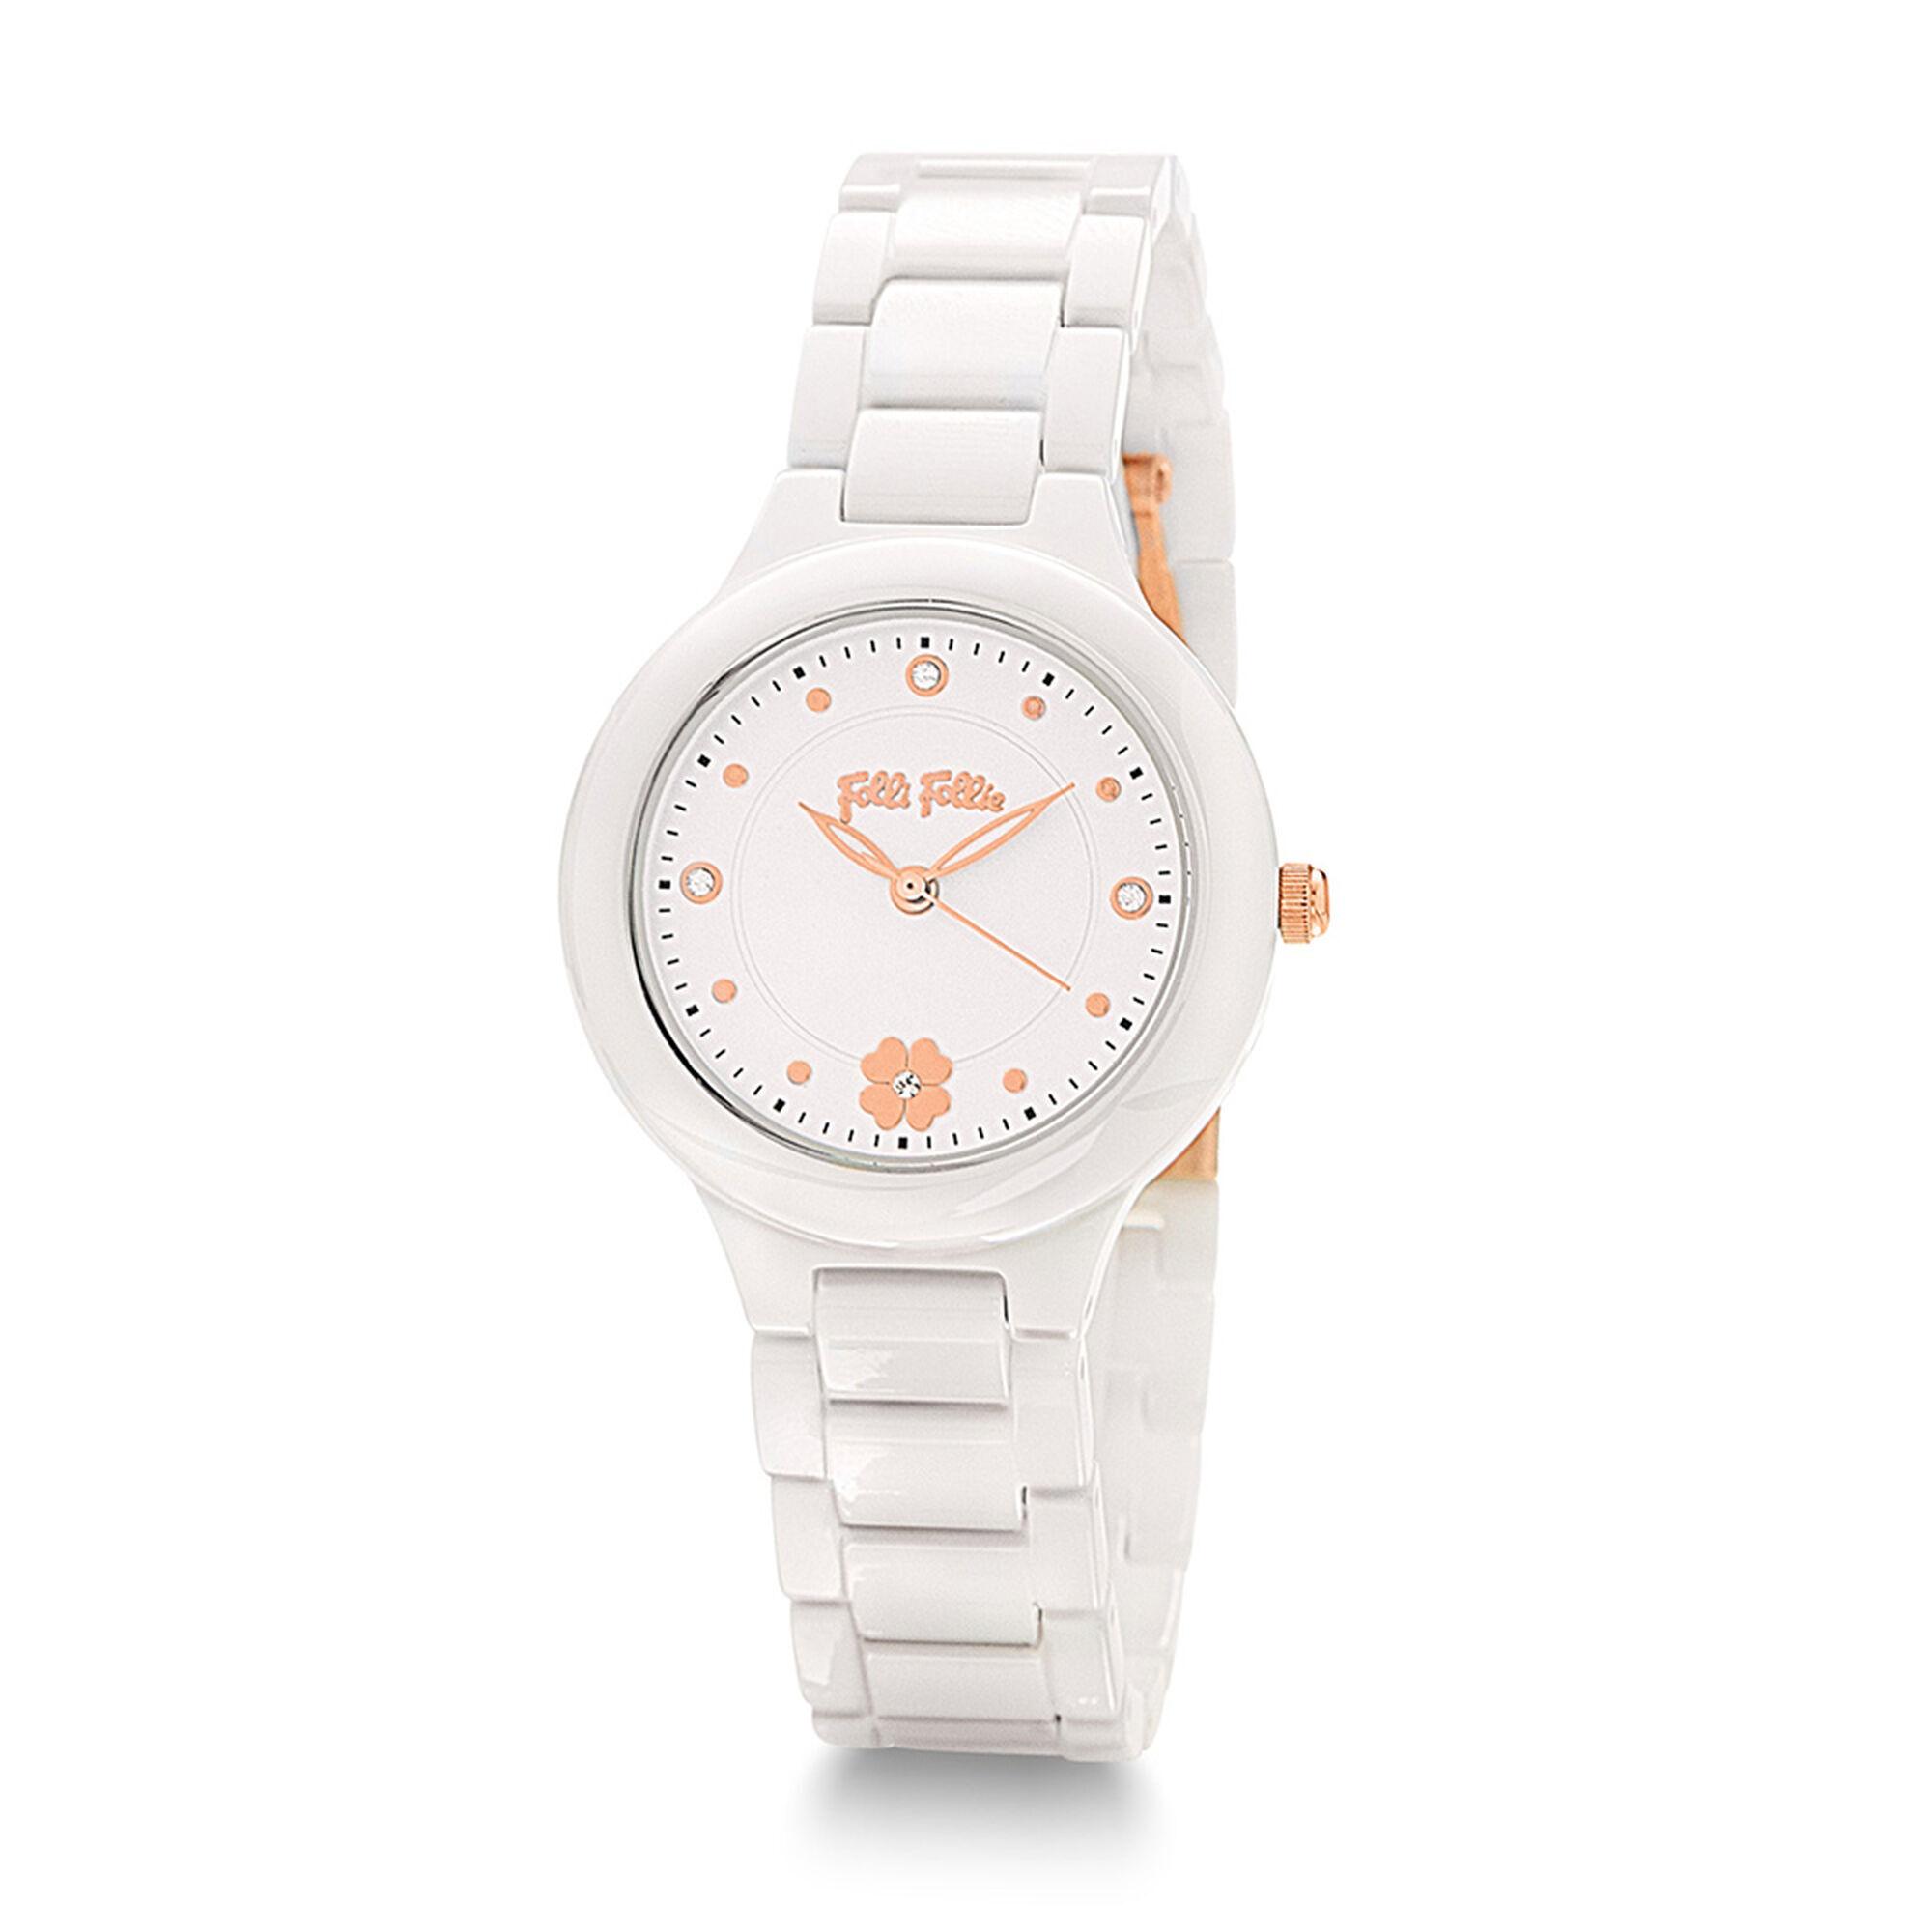 H4H FLORAL セラミックウォッチ/腕時計 ¥44,000↓